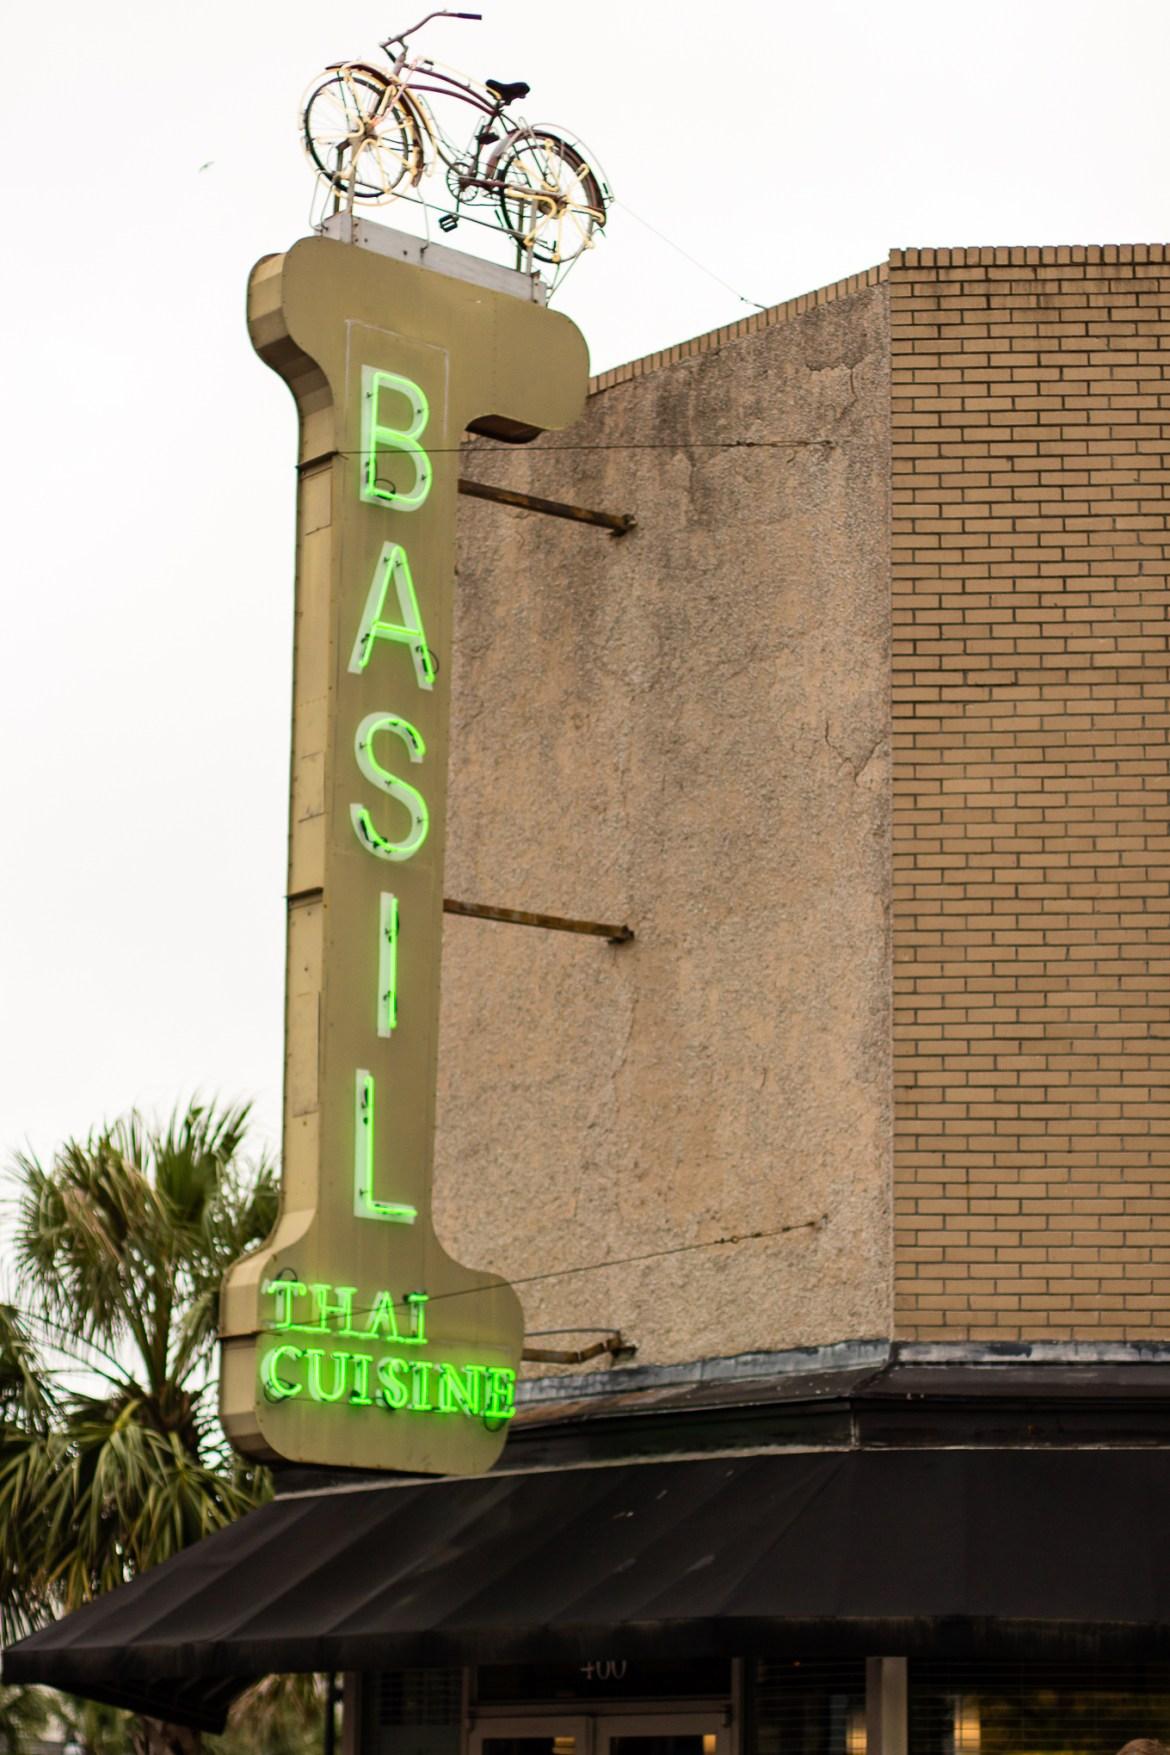 visit charleston, charleston, south carolina, travel, where to eat, where to visit